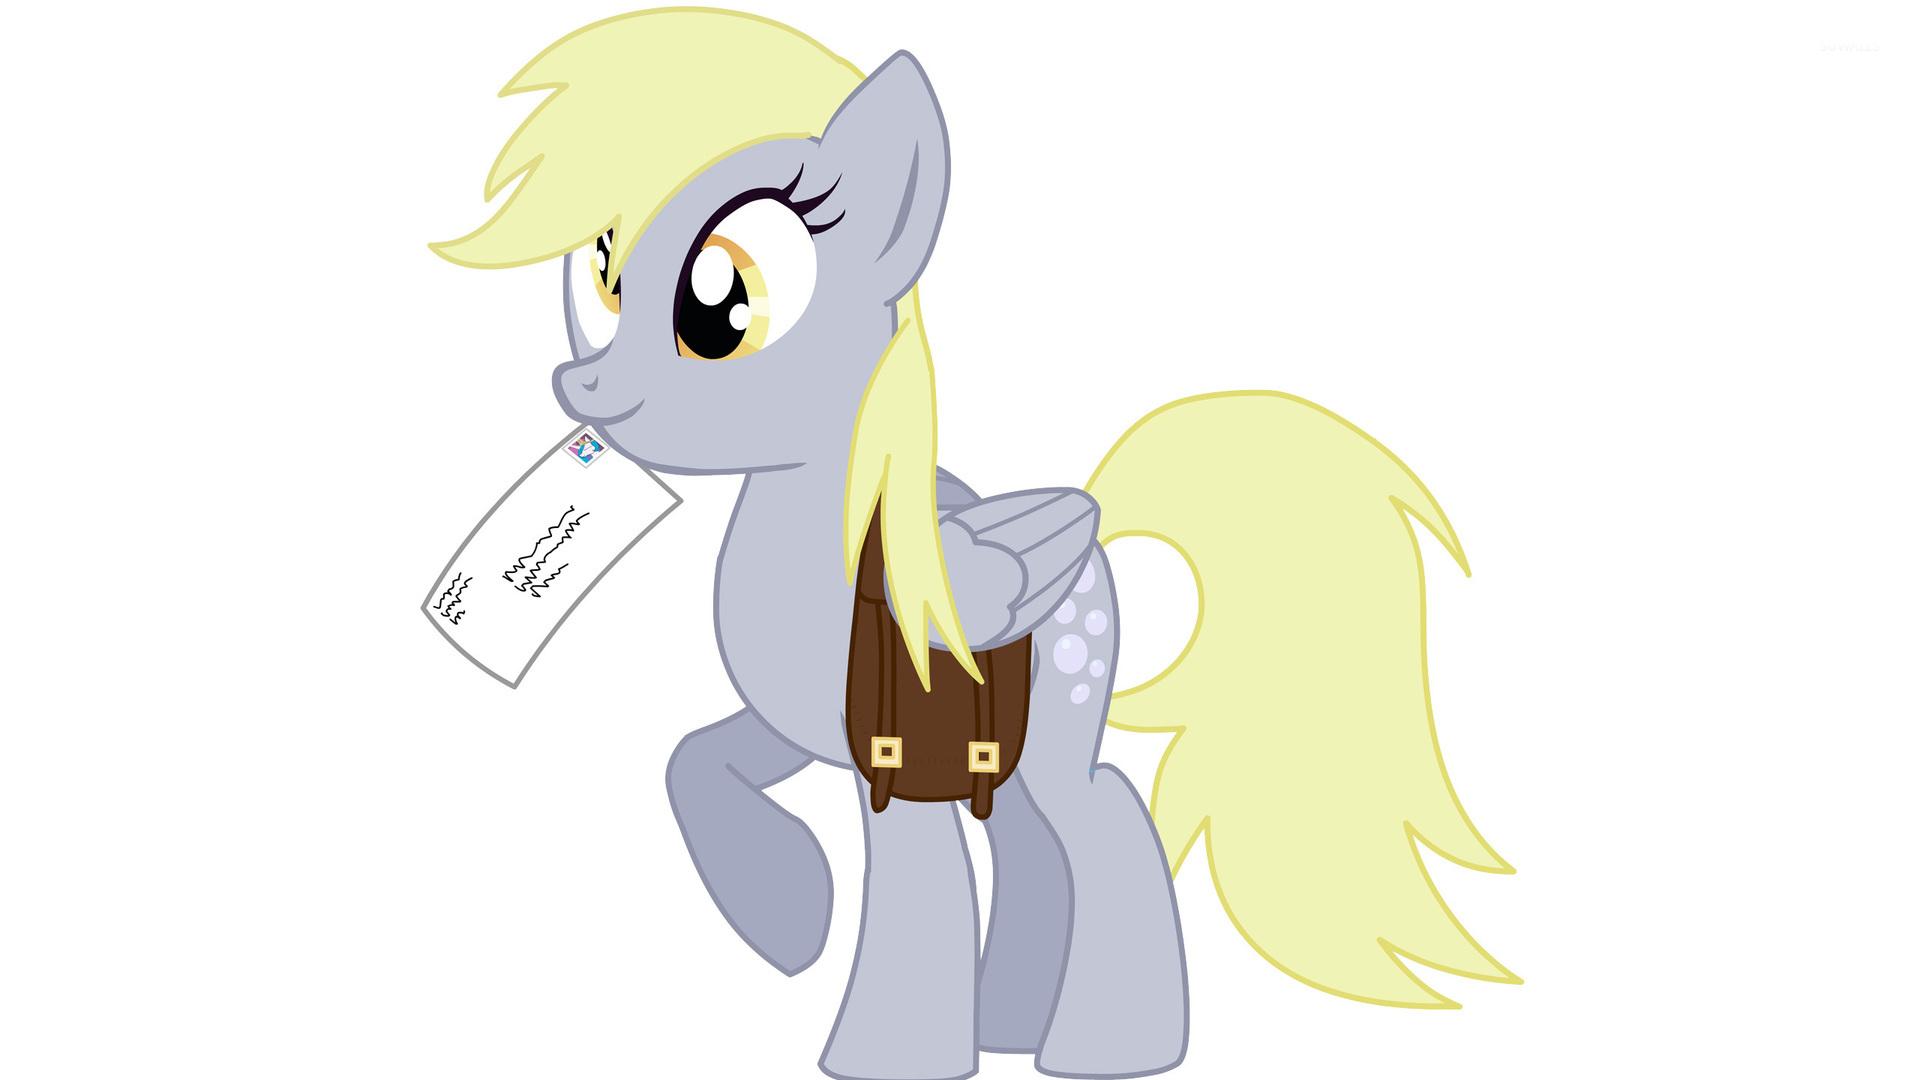 Derpy Hooves   My Little Pony Friendship is Magic wallpaper   Cartoon 1920x1080